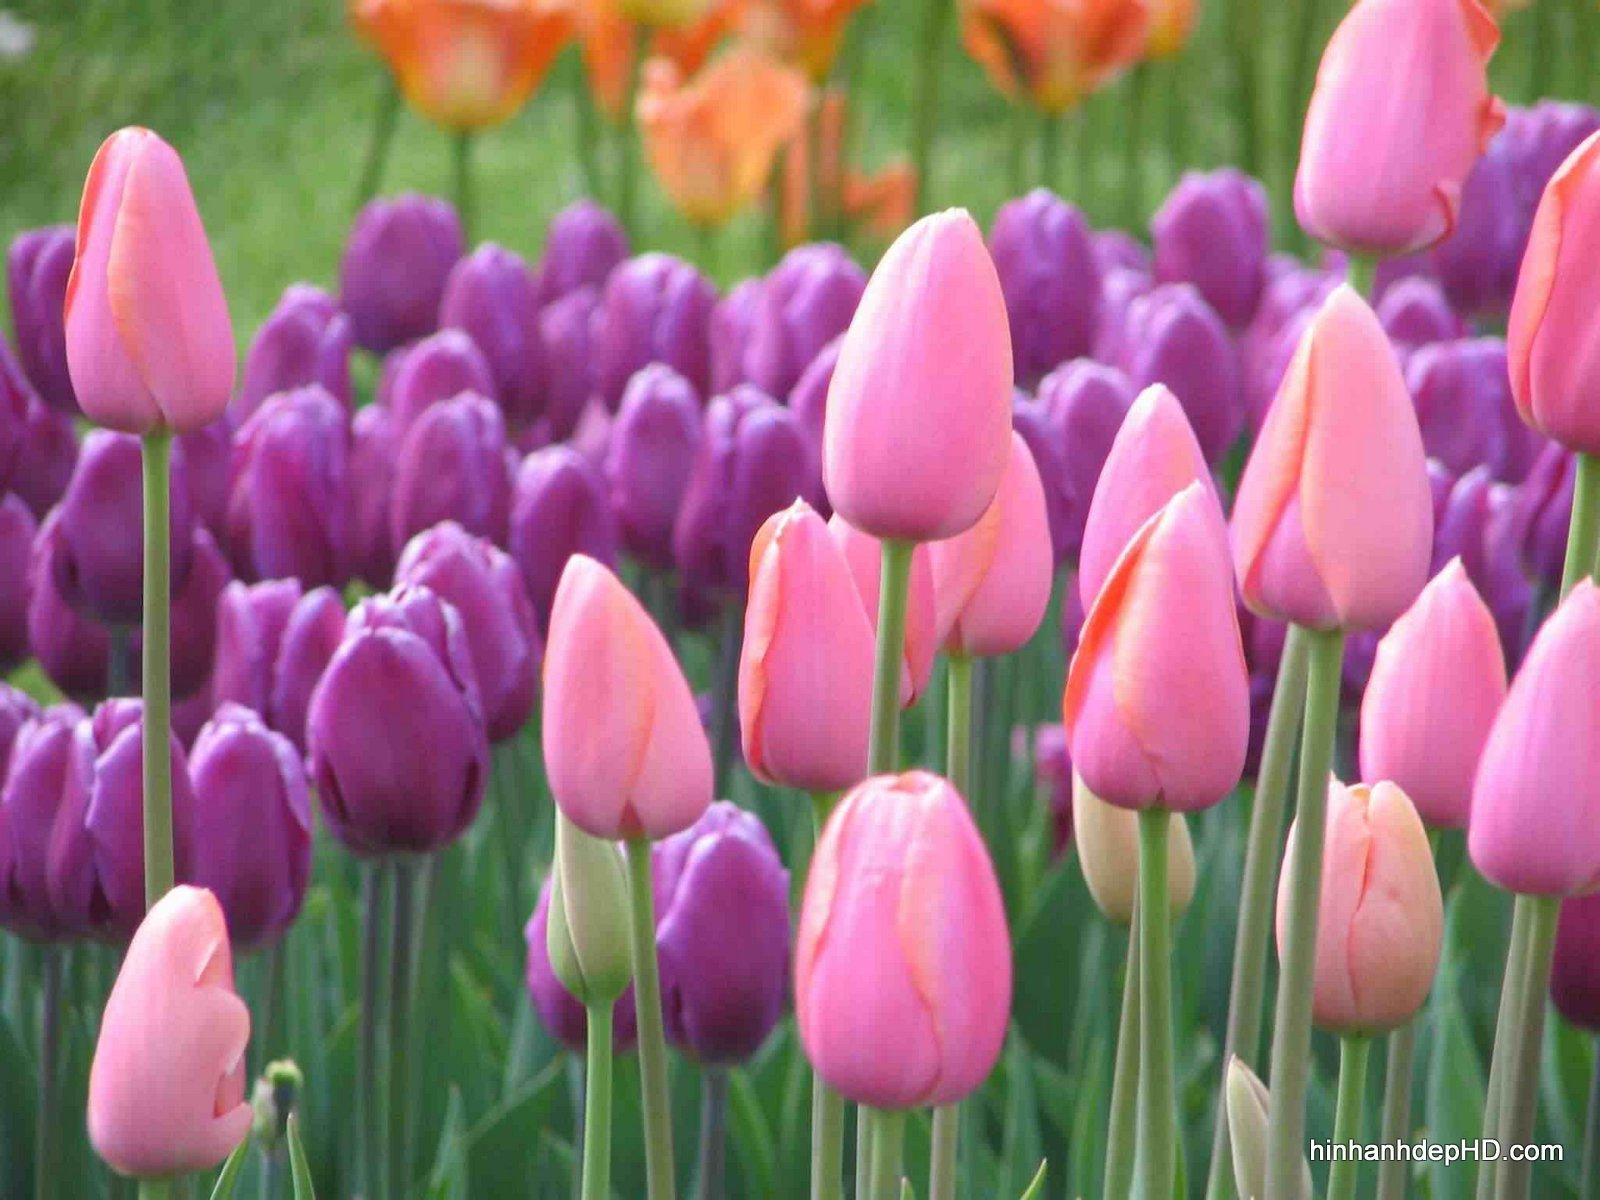 anh-dep-hoa-tulip-3823-14-